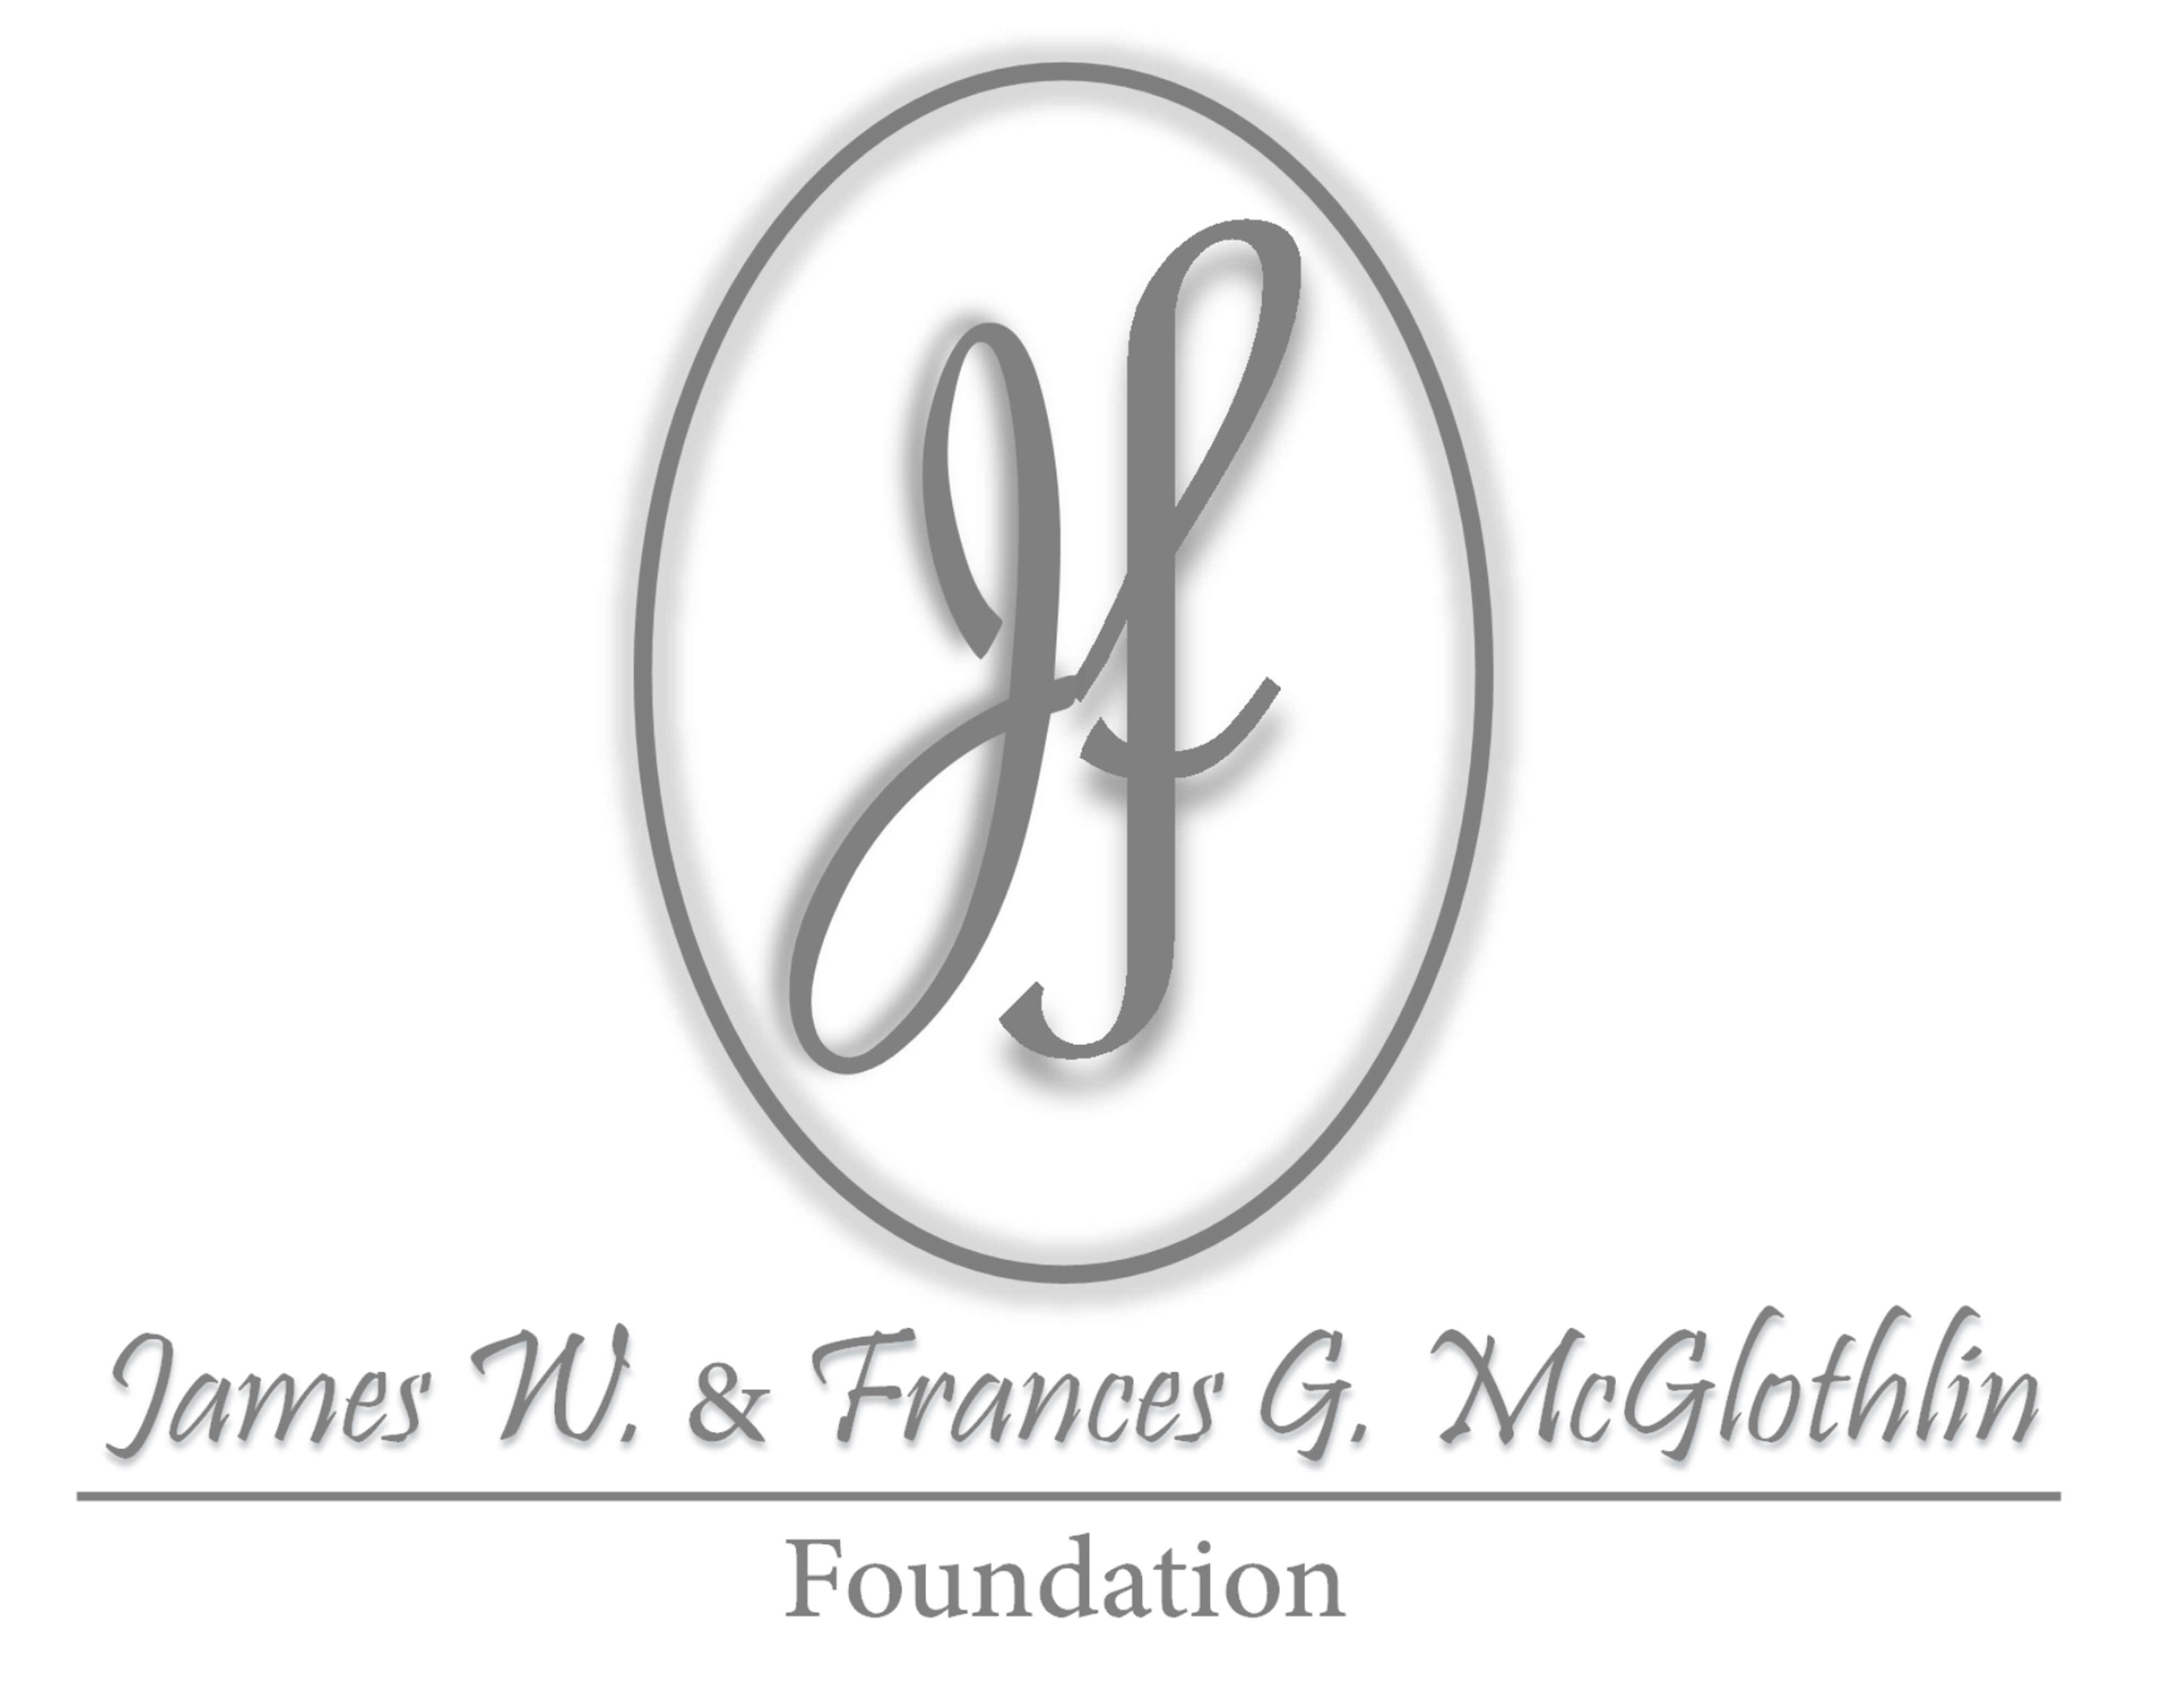 james w fances - HEAL Sponsor